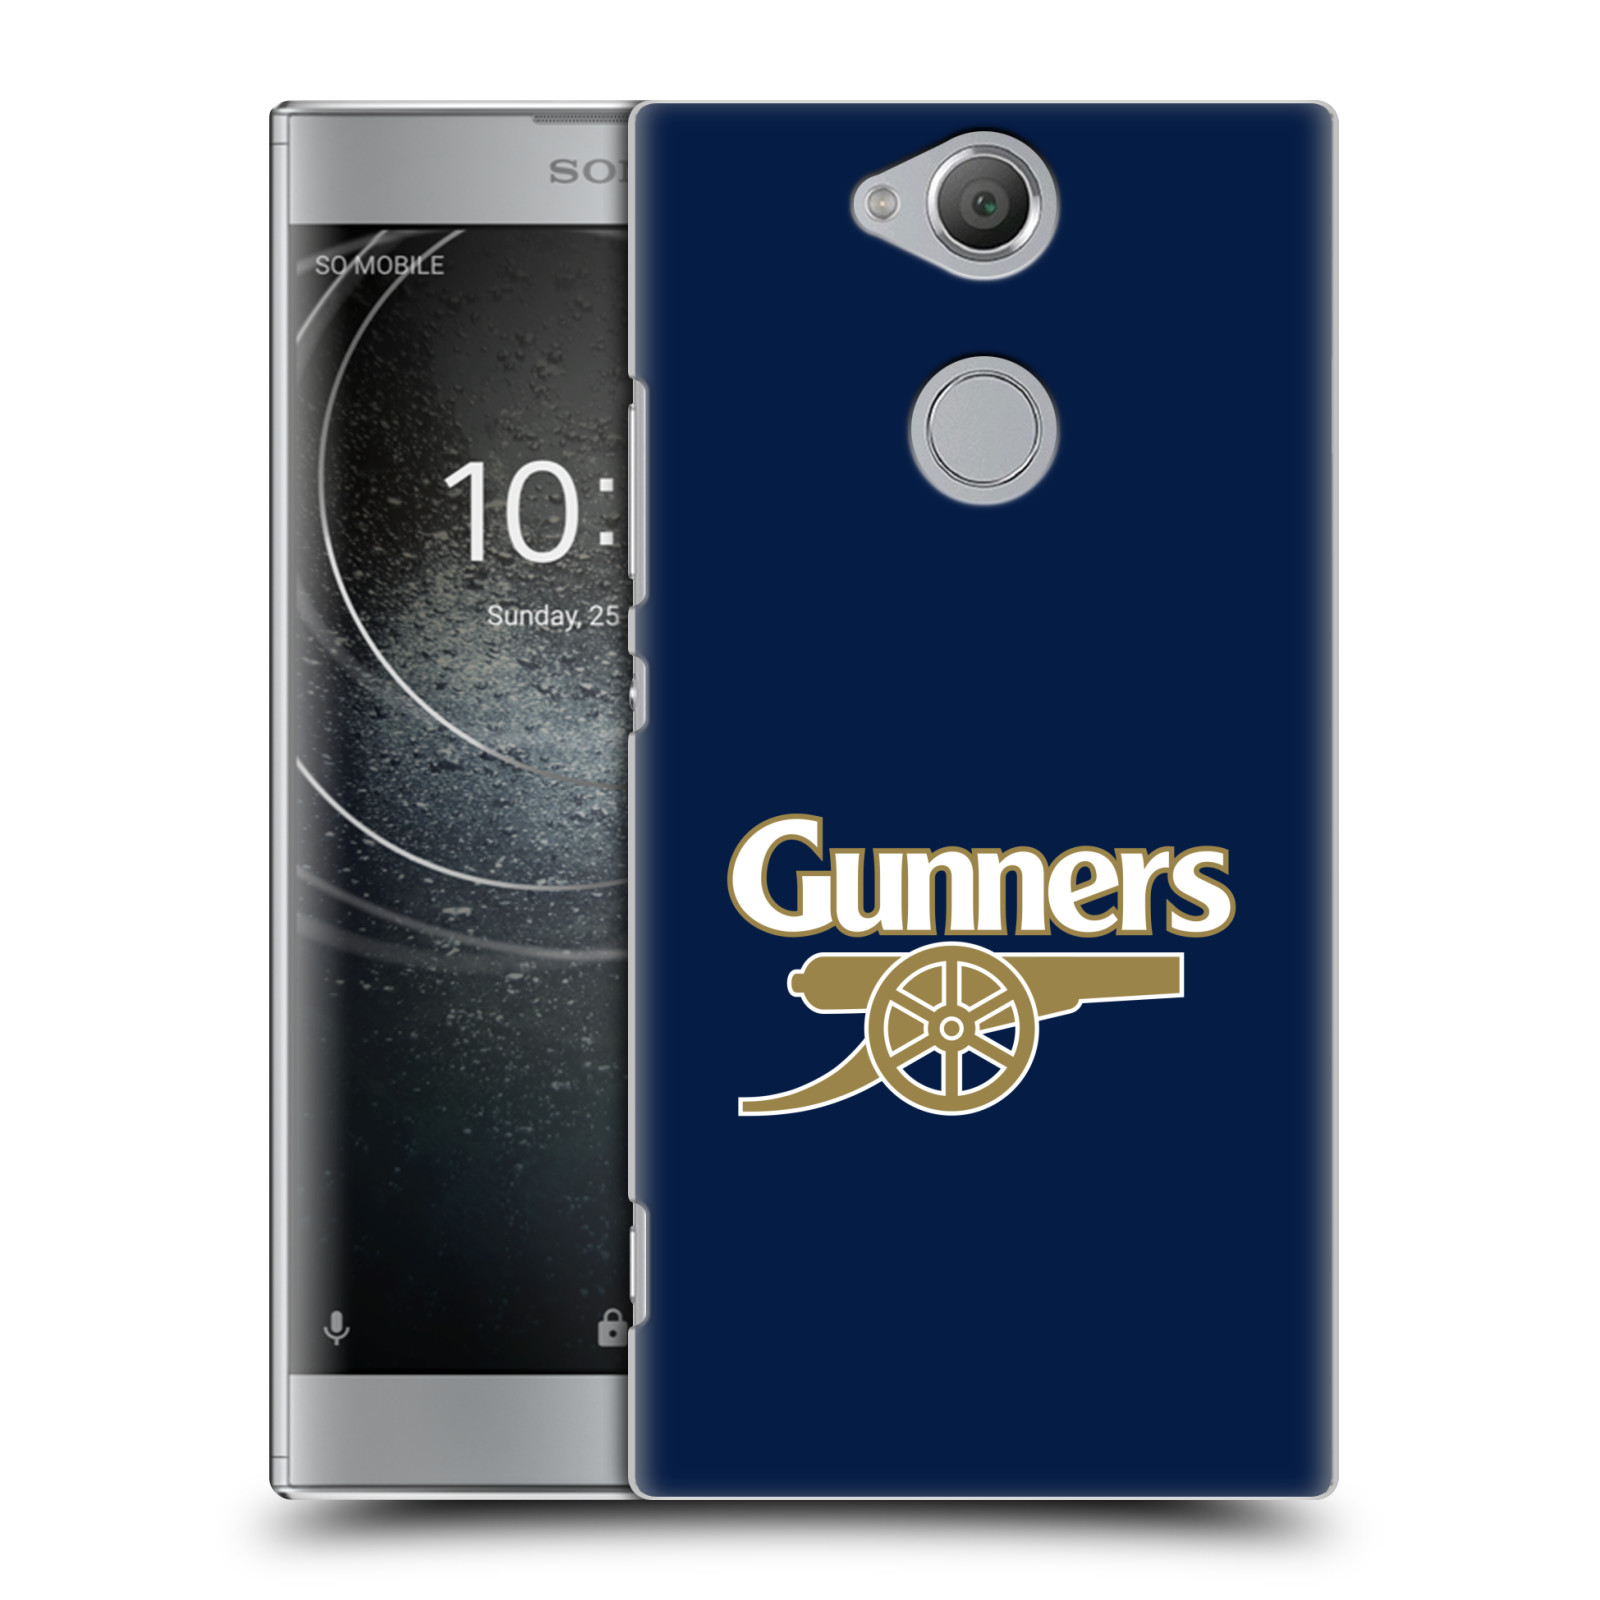 Plastové pouzdro na mobil Sony Xperia XA2 - Head Case - Arsenal FC - Gunners